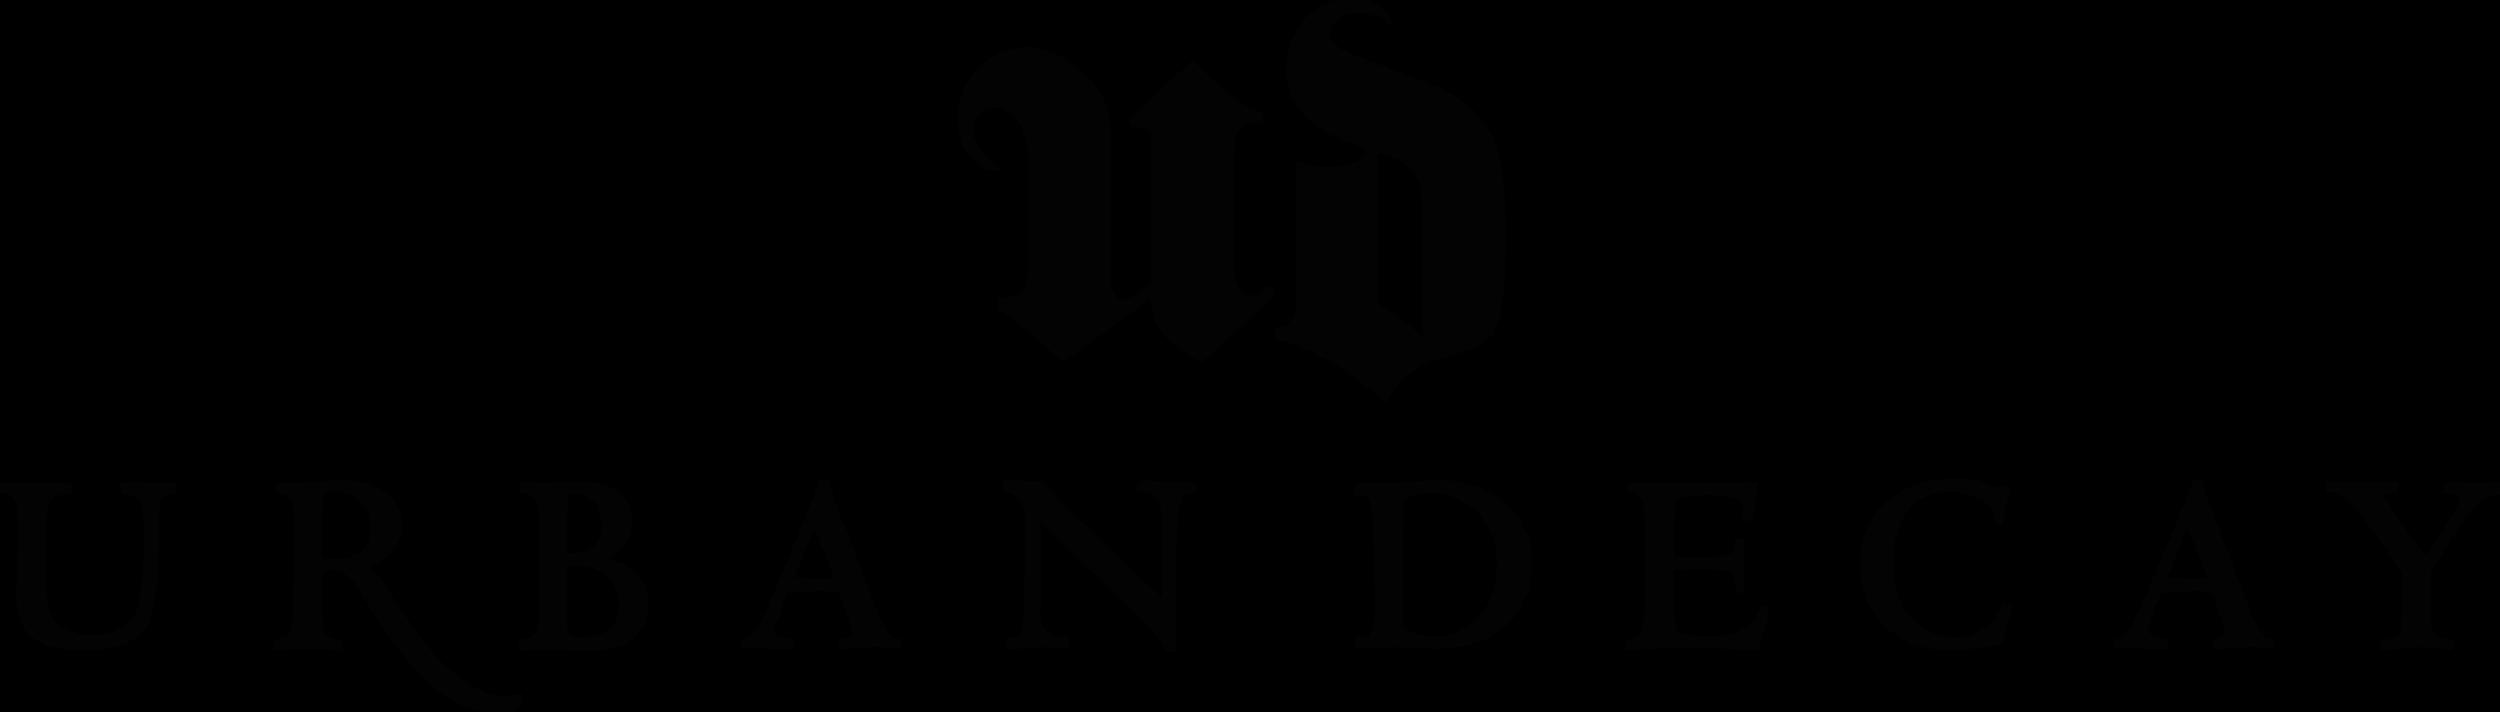 urban-decay-logo.png